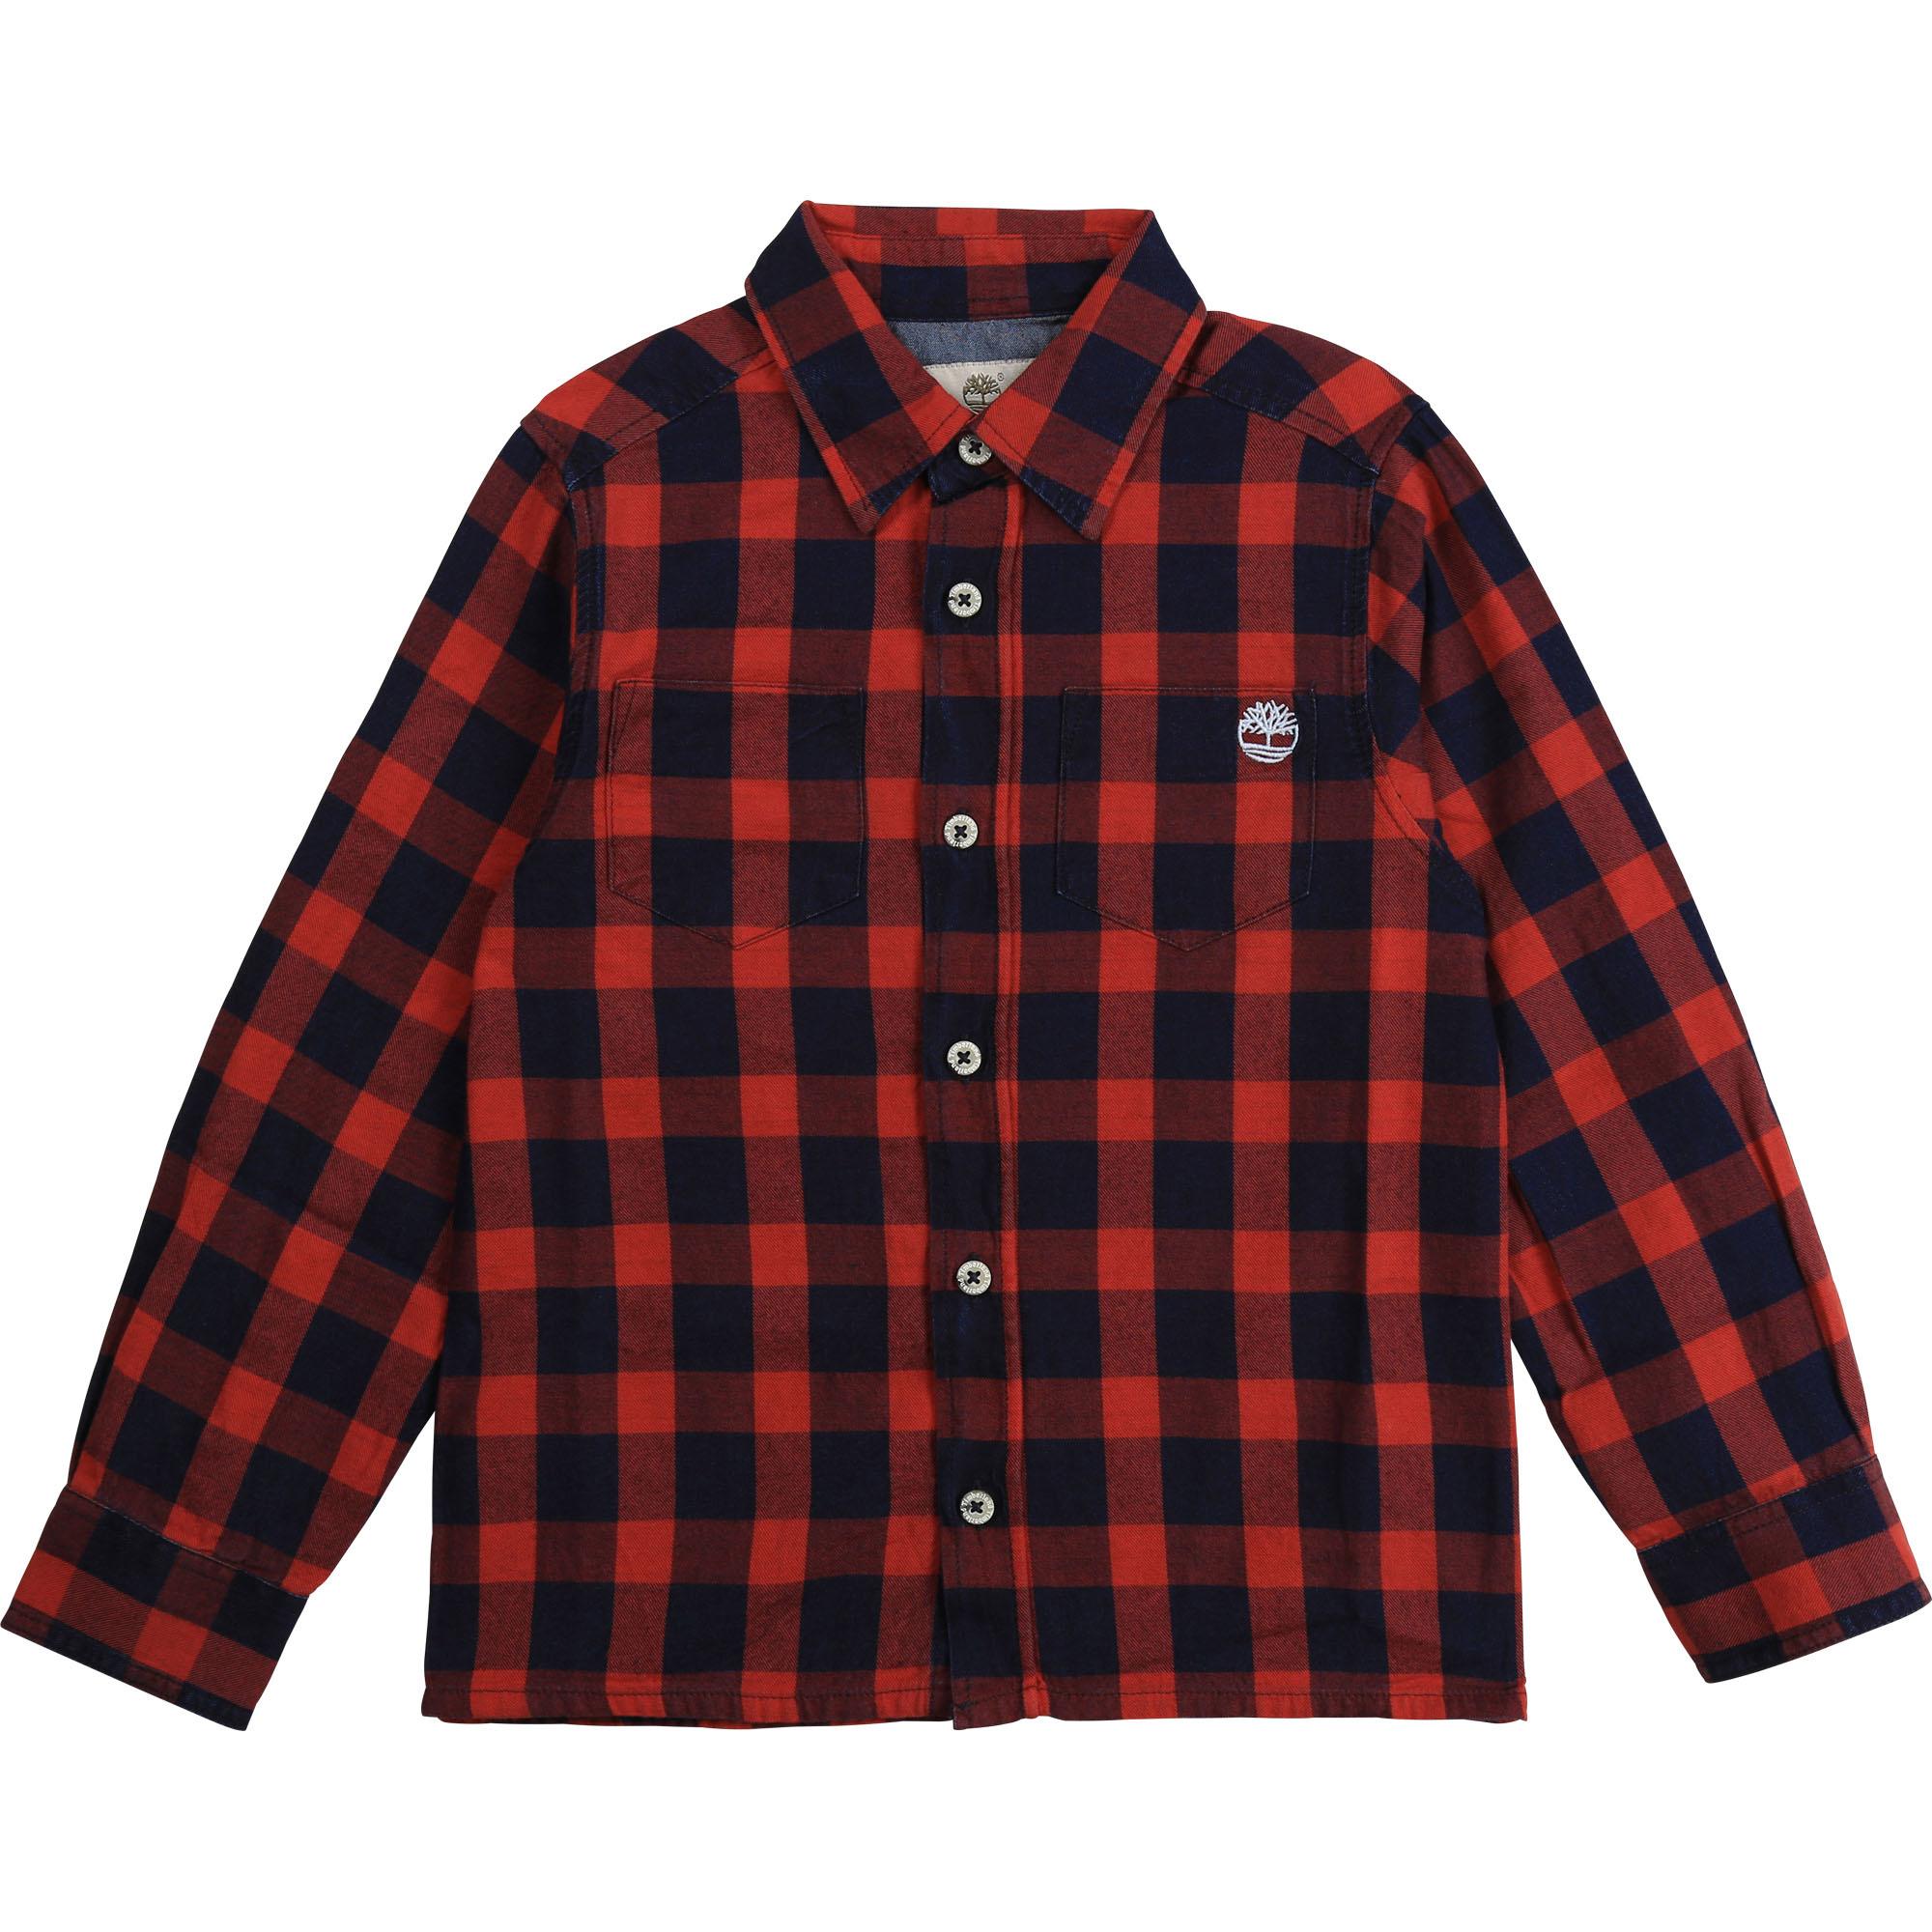 TIMBERLAND chemise rouge vif-1